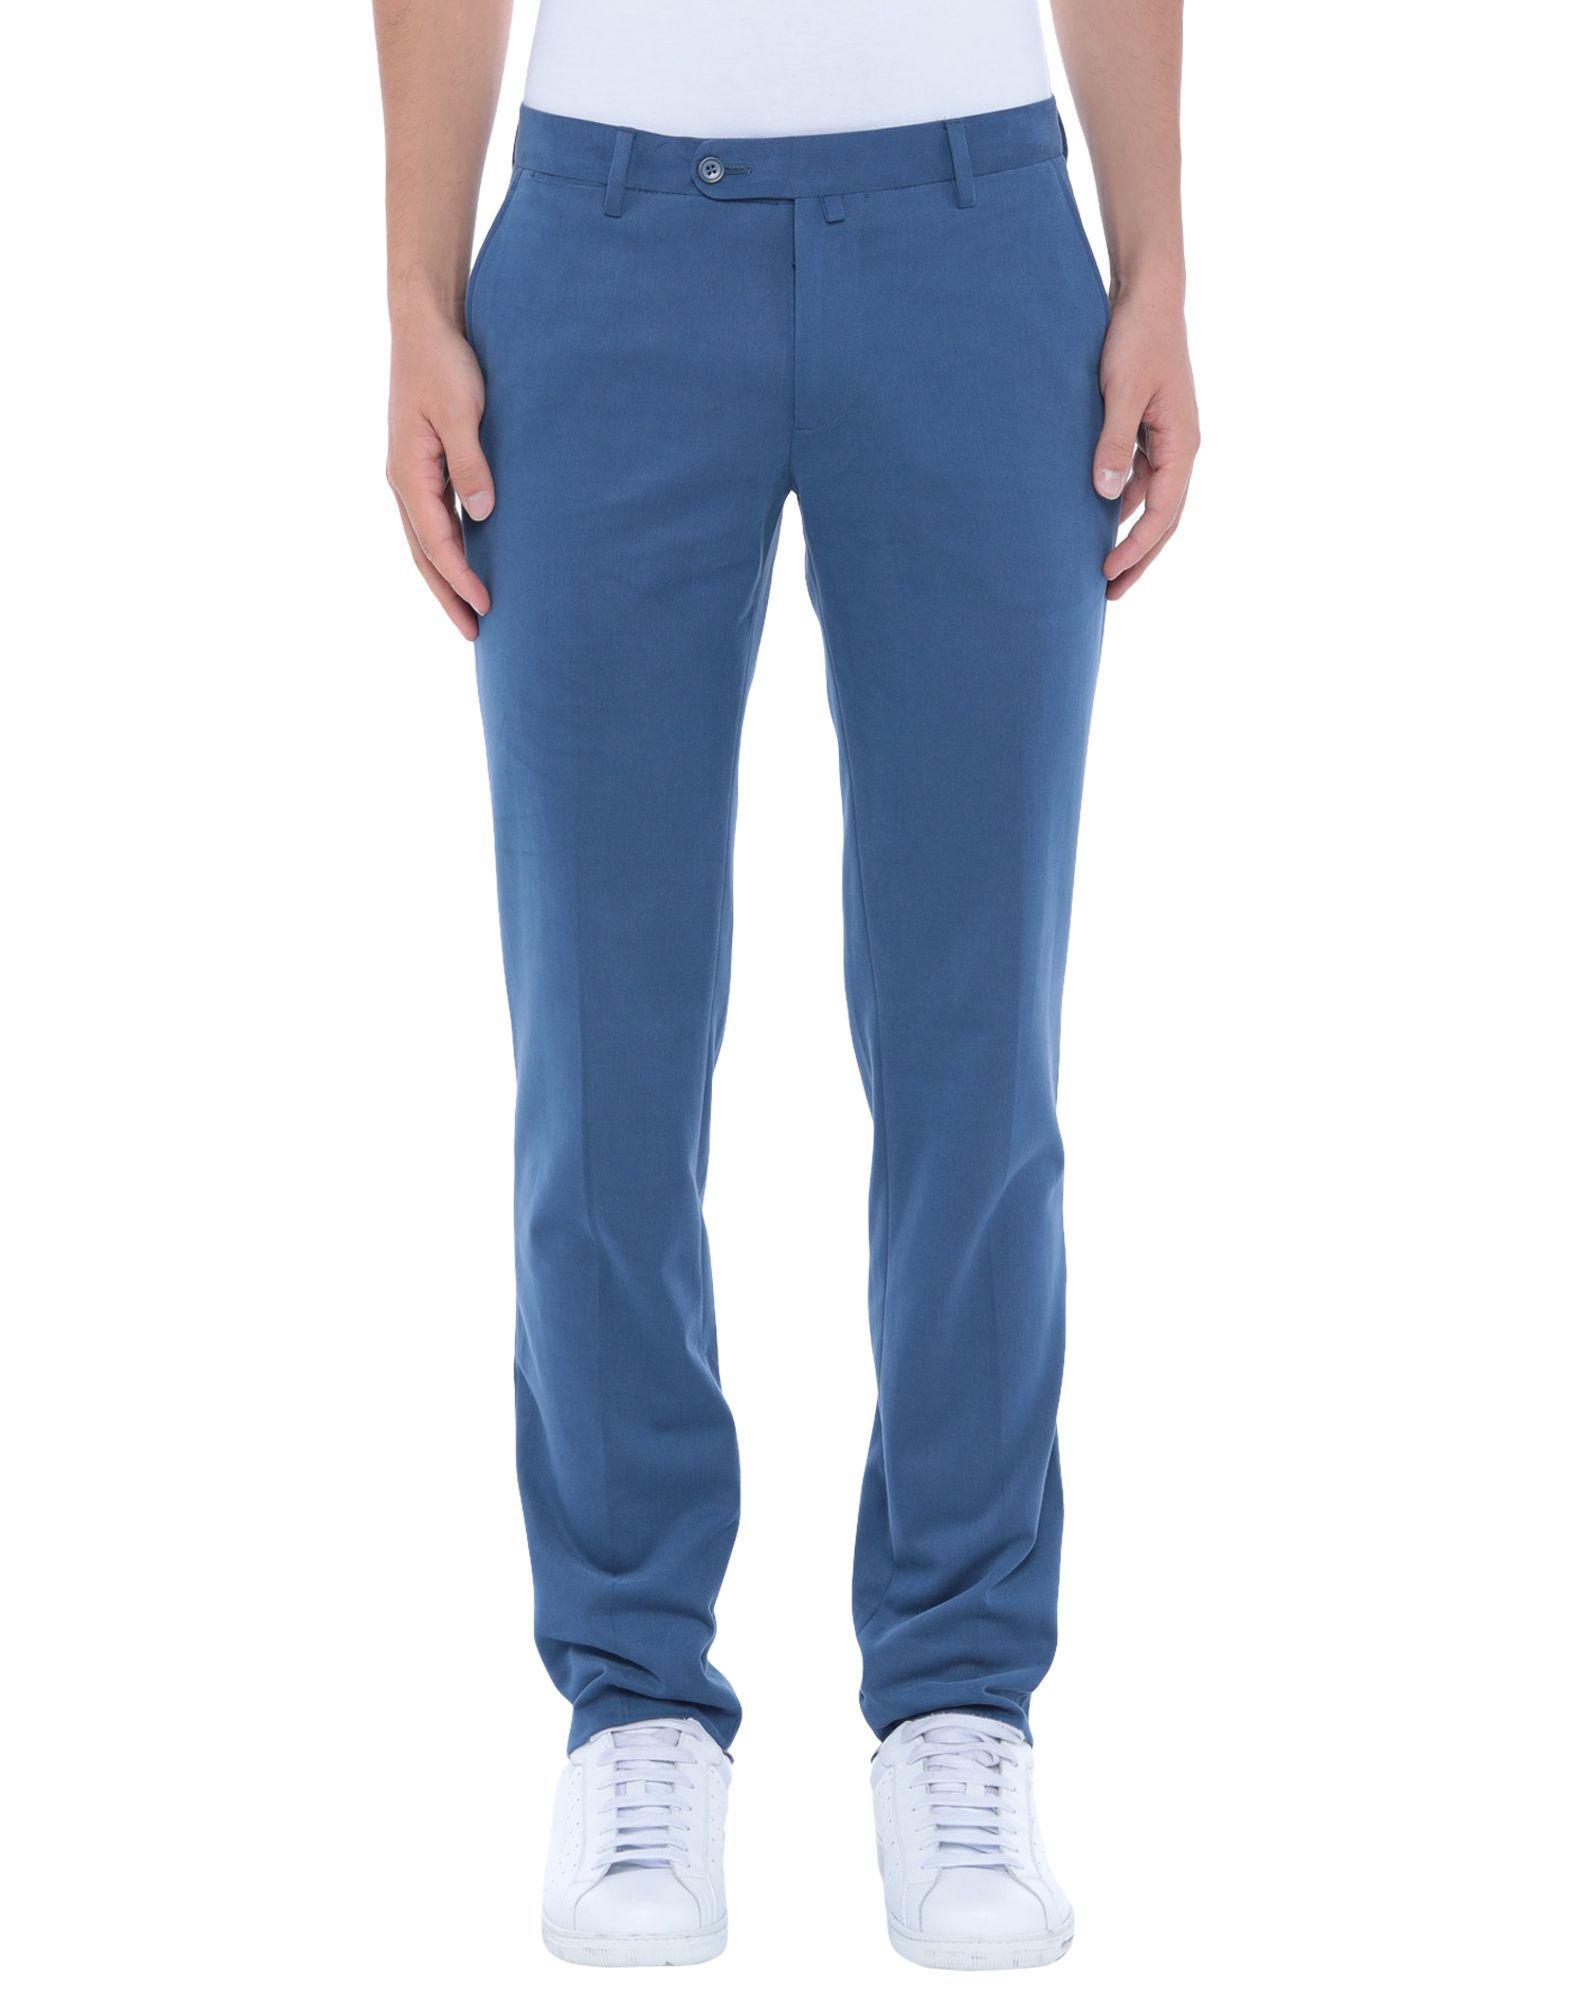 Luigi Borrelli Napoli Slate Blue Cotton Trousers